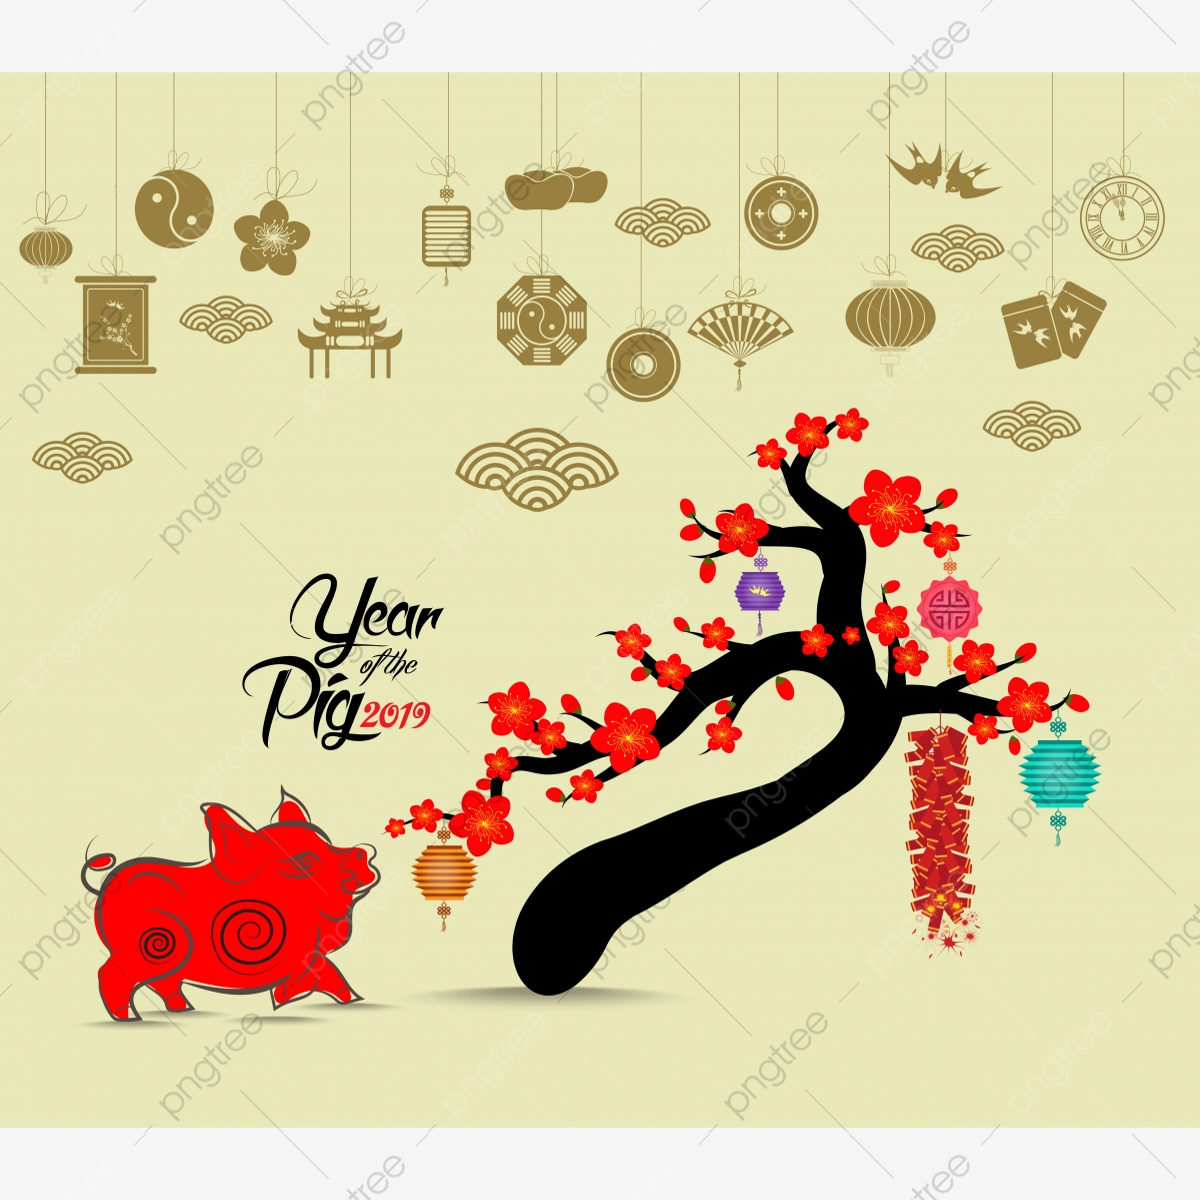 Año Nuevo Chino Linterna Decoracion Para Blossom Festival De